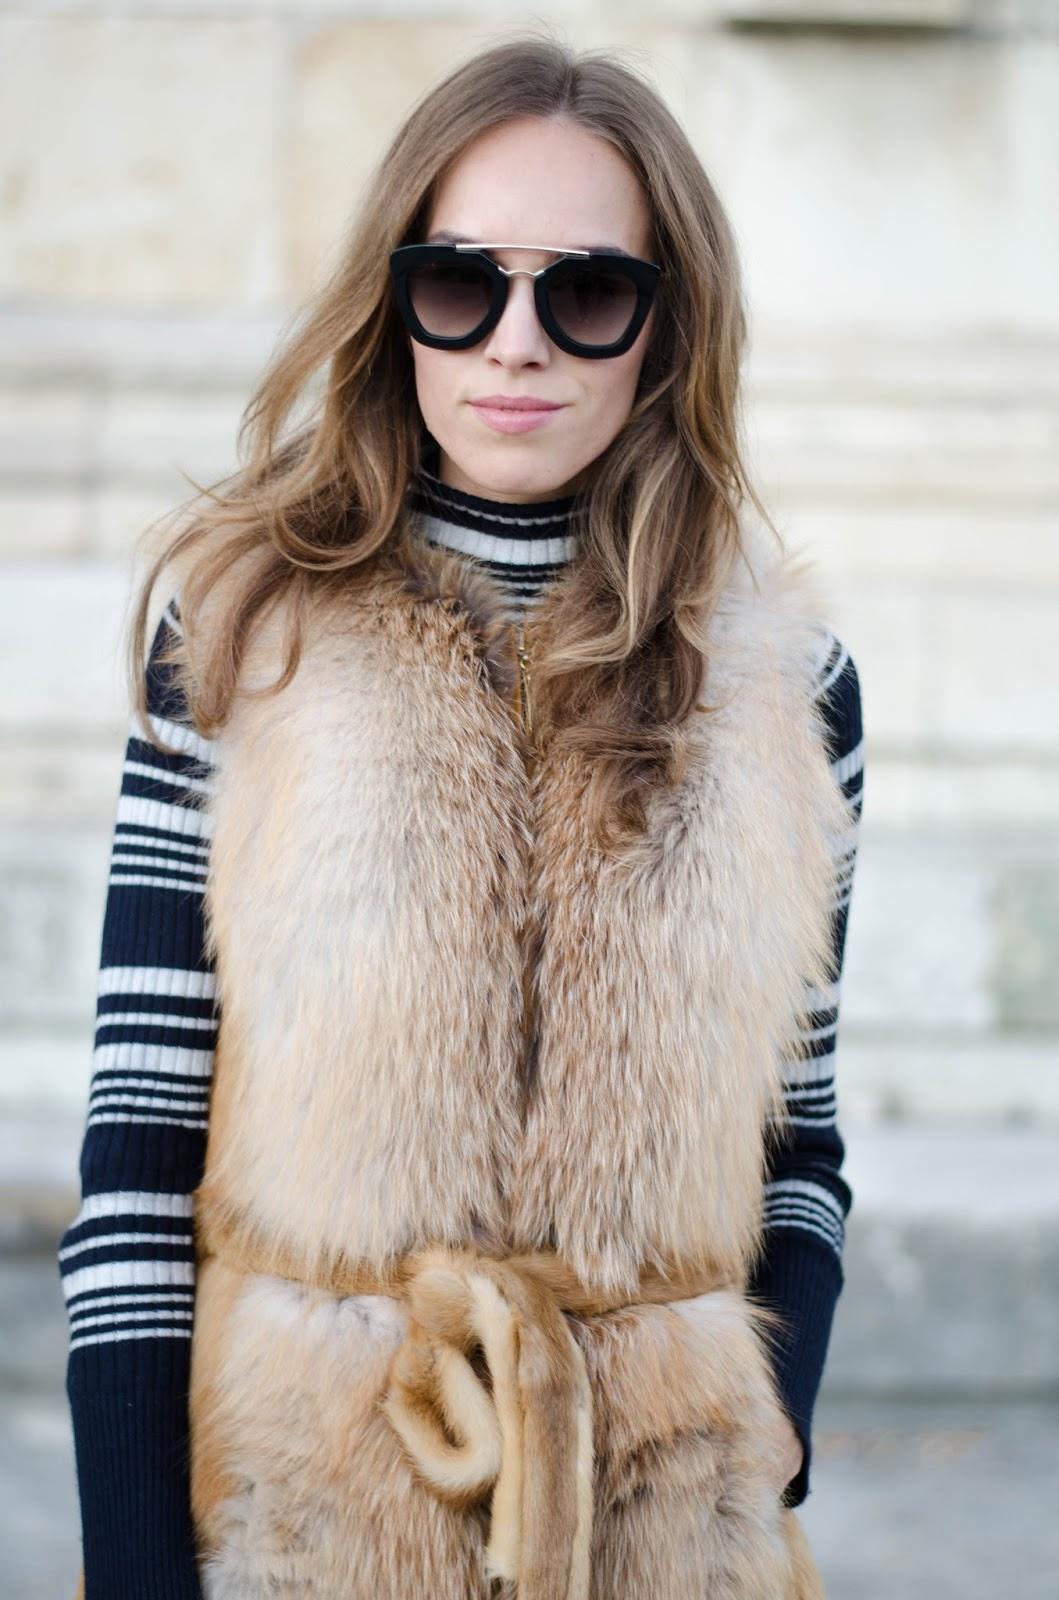 kristjaana mere prada sunglasses fox fur vest fall outfit inspo 70s